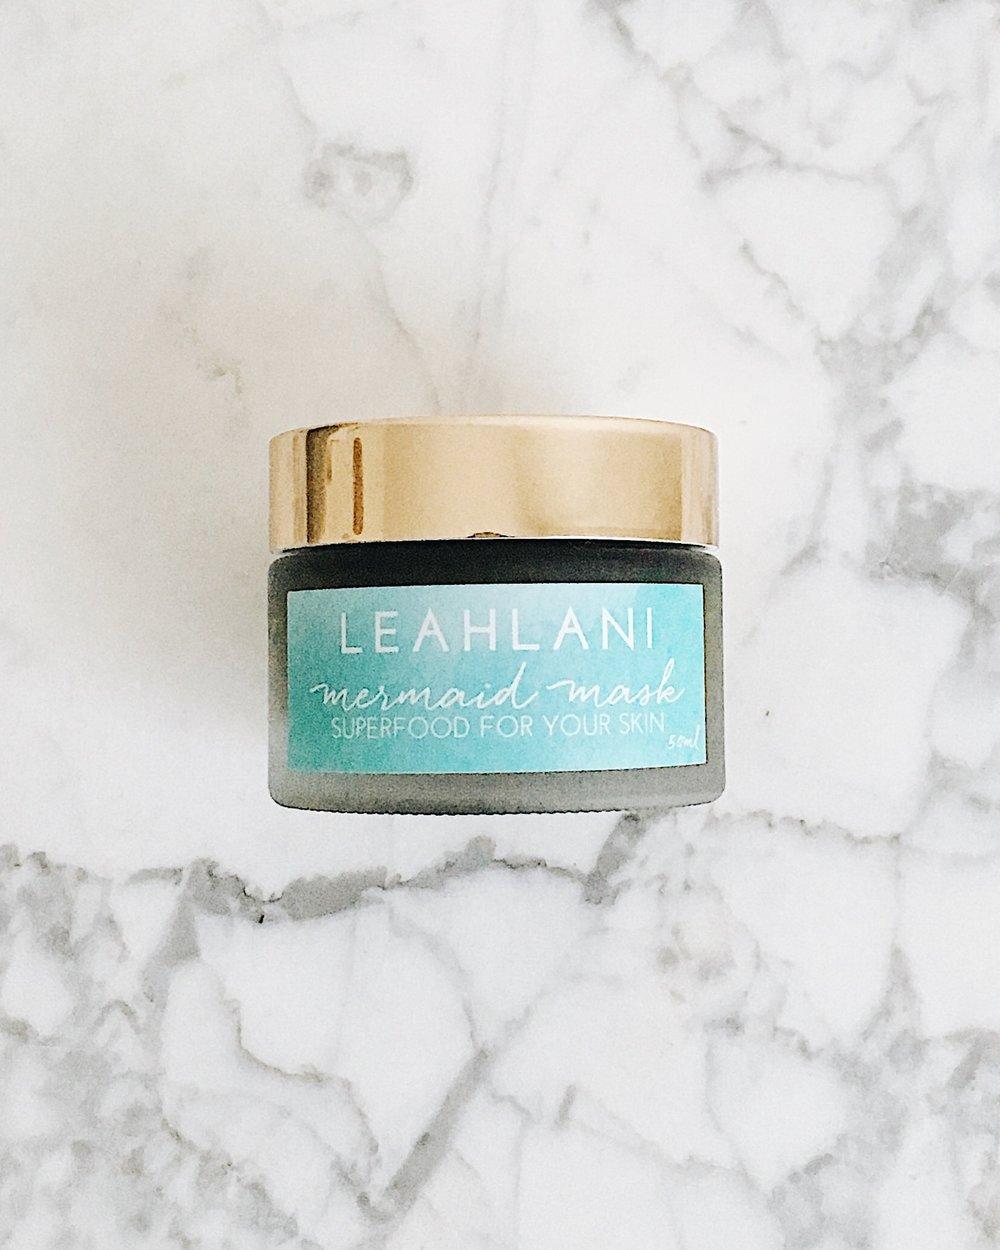 Mermaid Mask by Leahlani Skincare